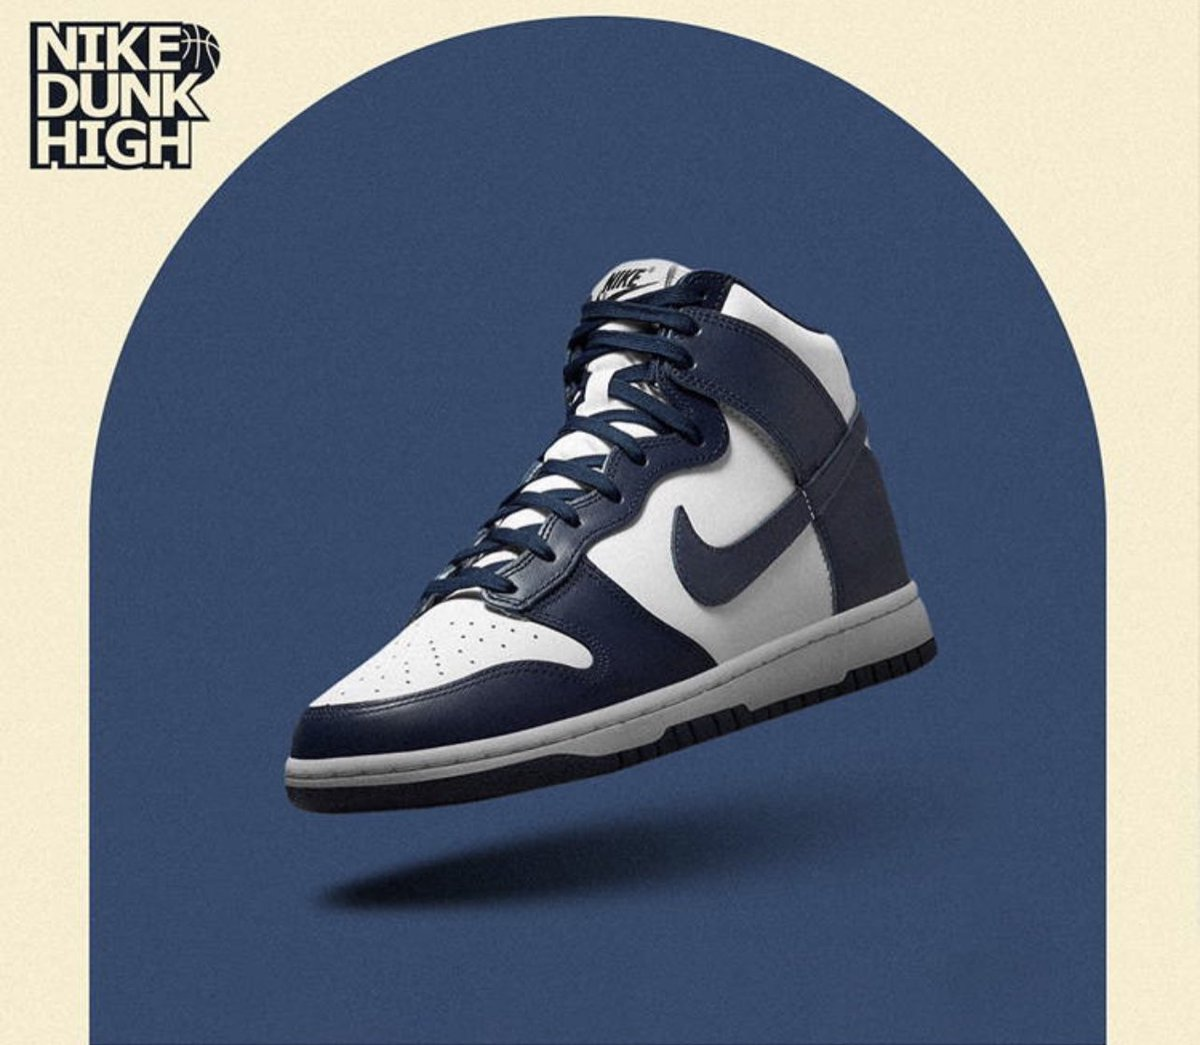 RESTOCK Nike Dunk High 'Midnight Navy'  FNL: JD: